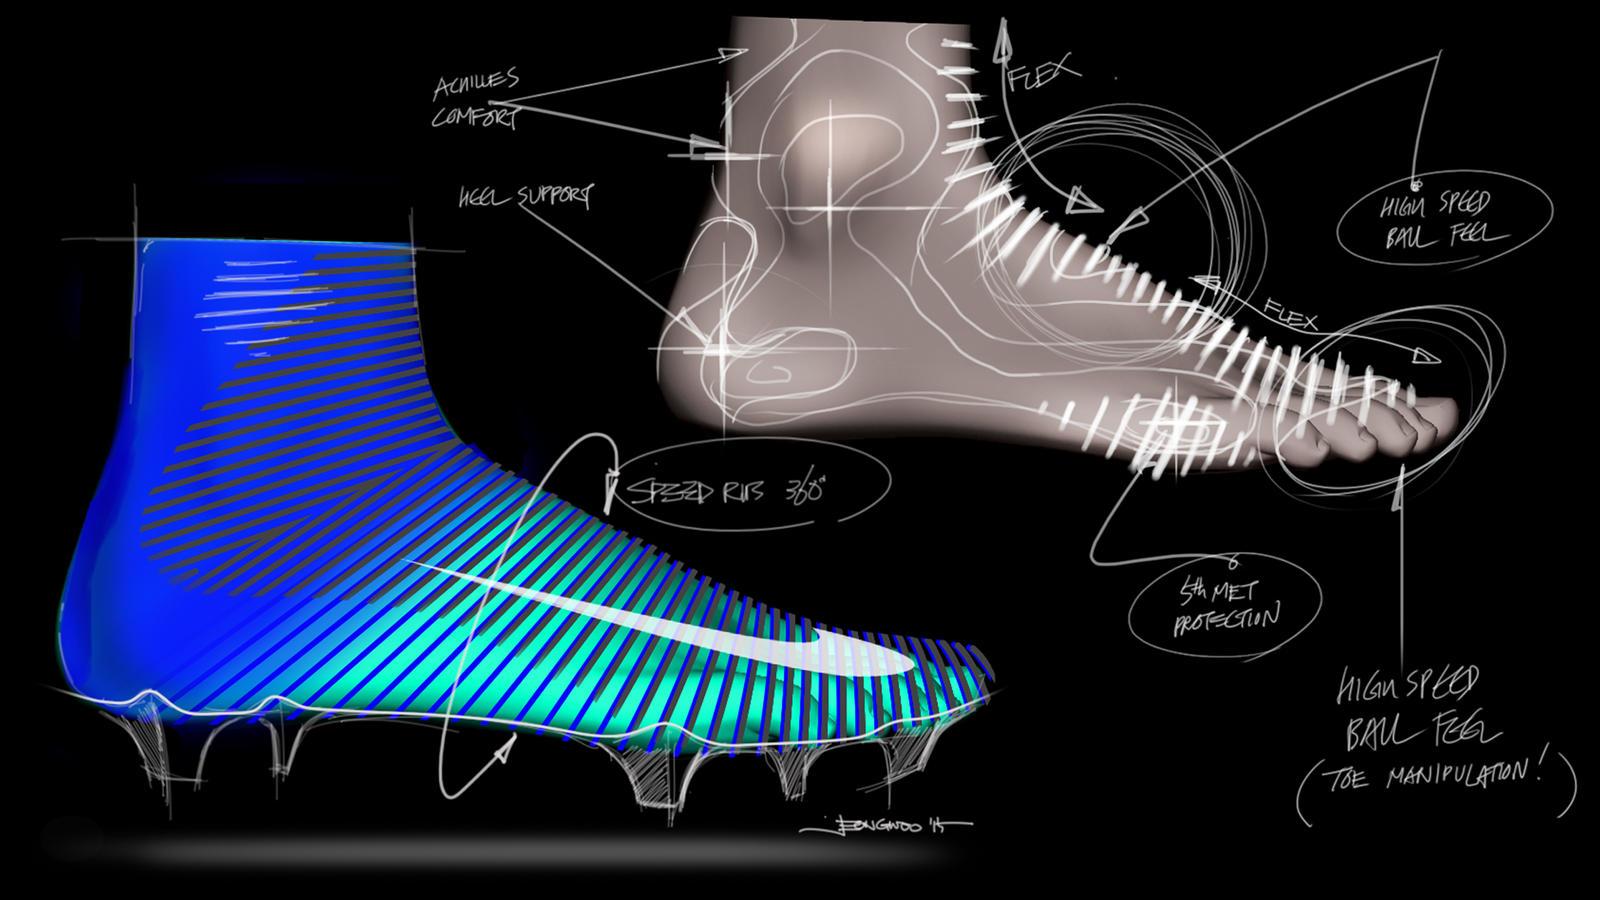 c313dcf43 Nike Mercurial Superfly - Nike News